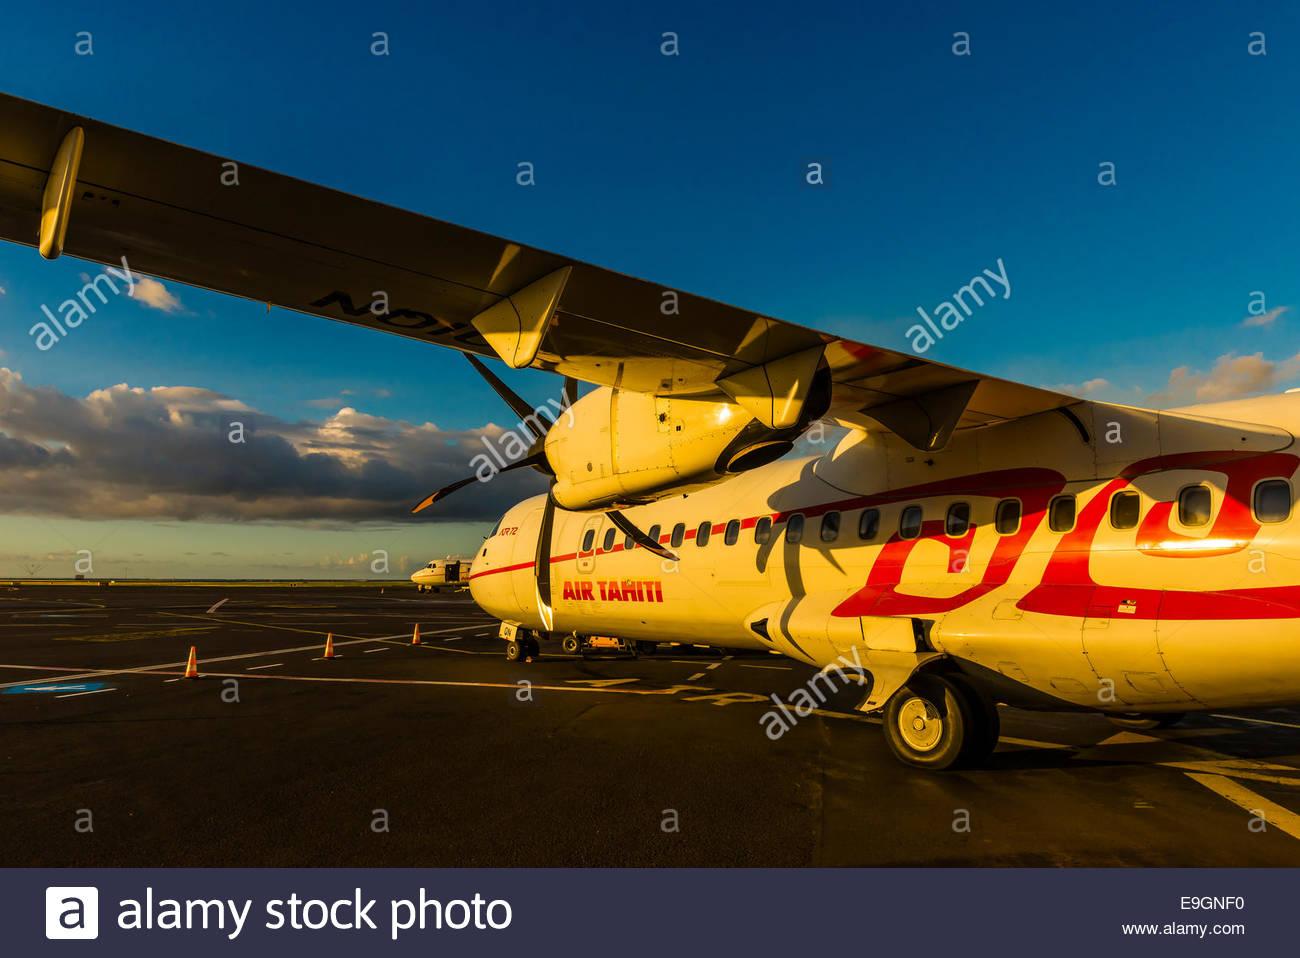 Air Tahiti ATR 72 Turboprop aircraft, Fa'a'ā International Airport, Faaa, Tahiti, French Polynesia. - Stock Image